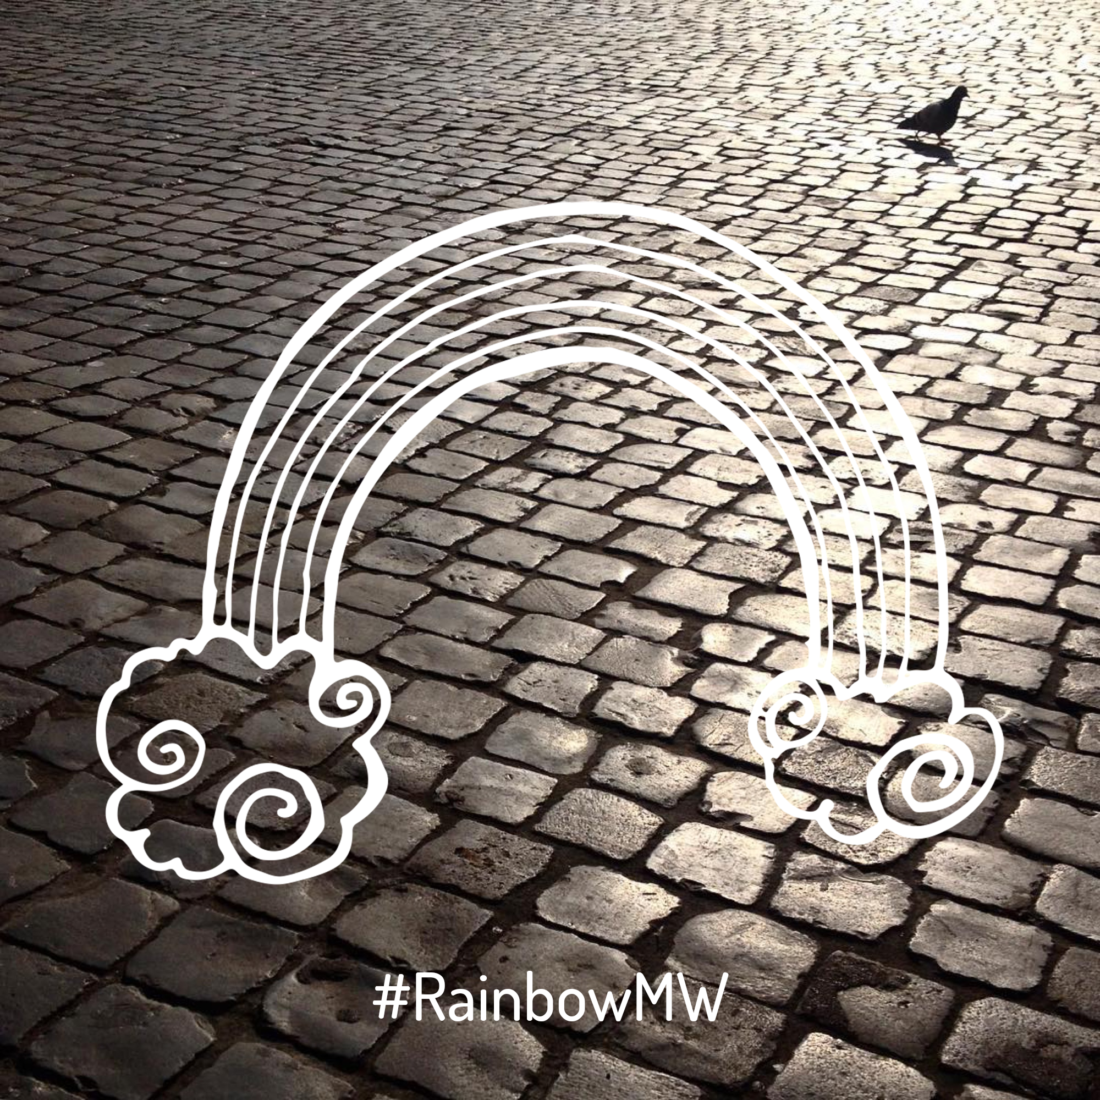 #RainbowMW